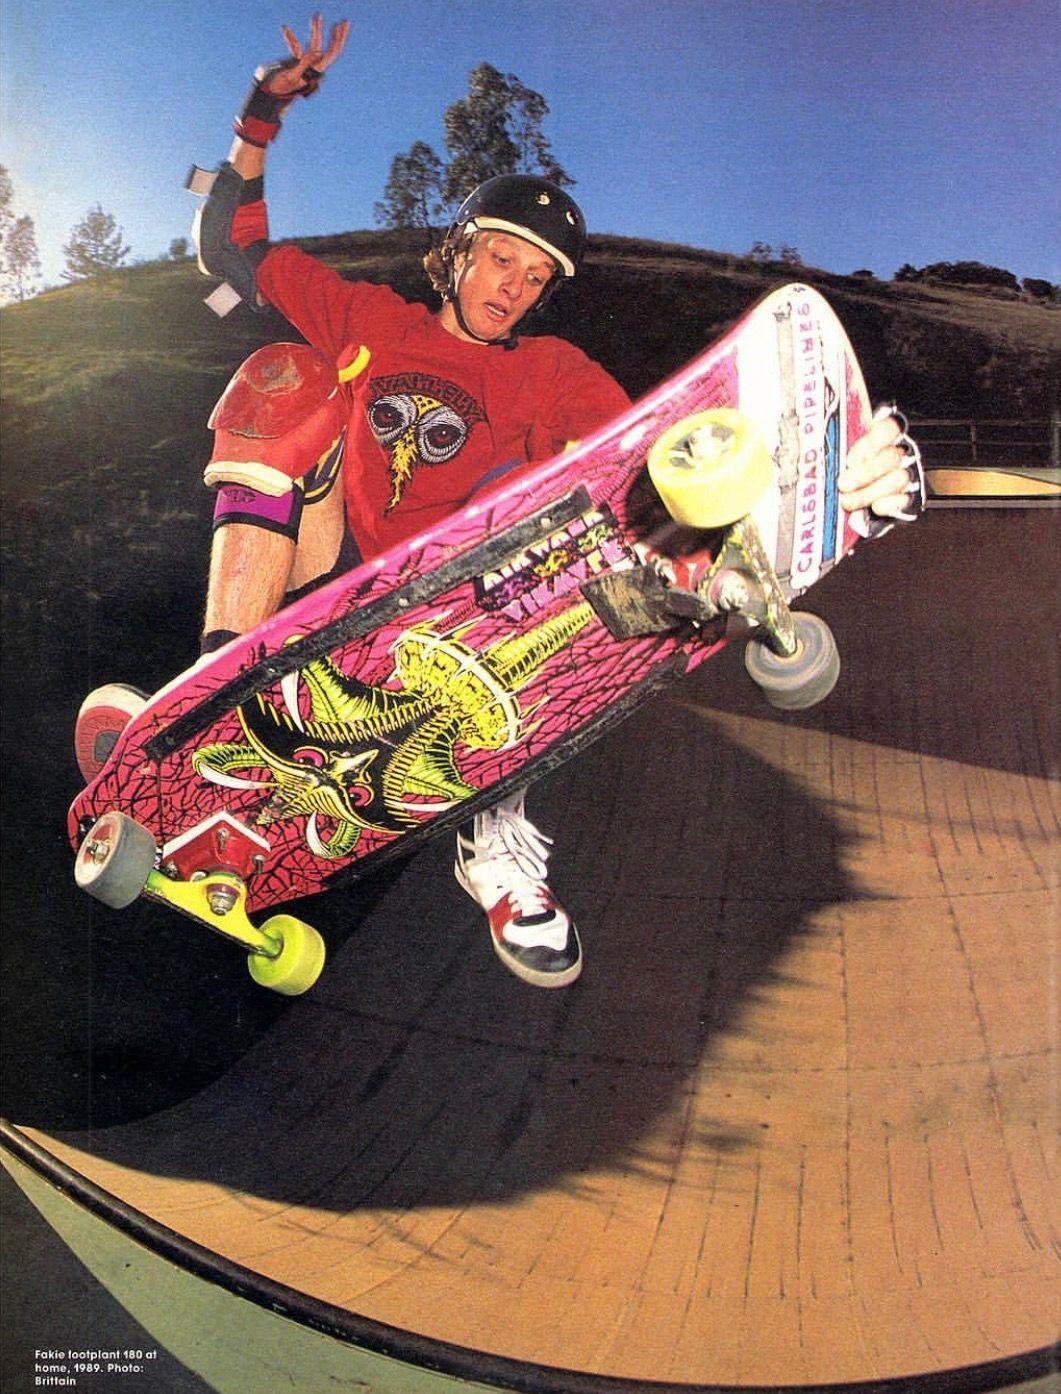 Skateboard Tony Hawk 360